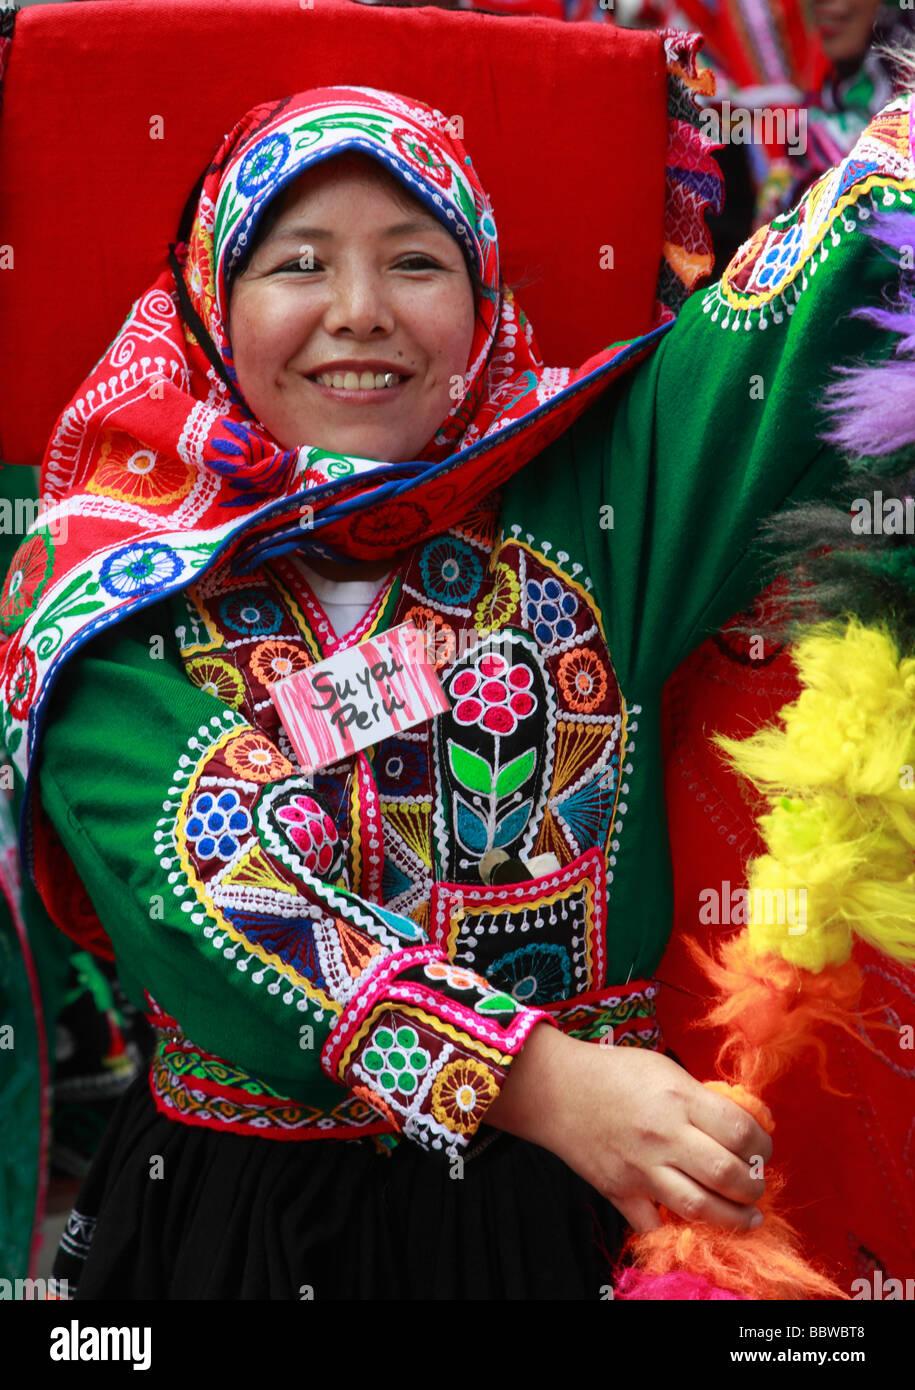 Deutschland-Berlin-Karneval der Kulturen peruanische Frau in traditioneller Kleidung Stockbild